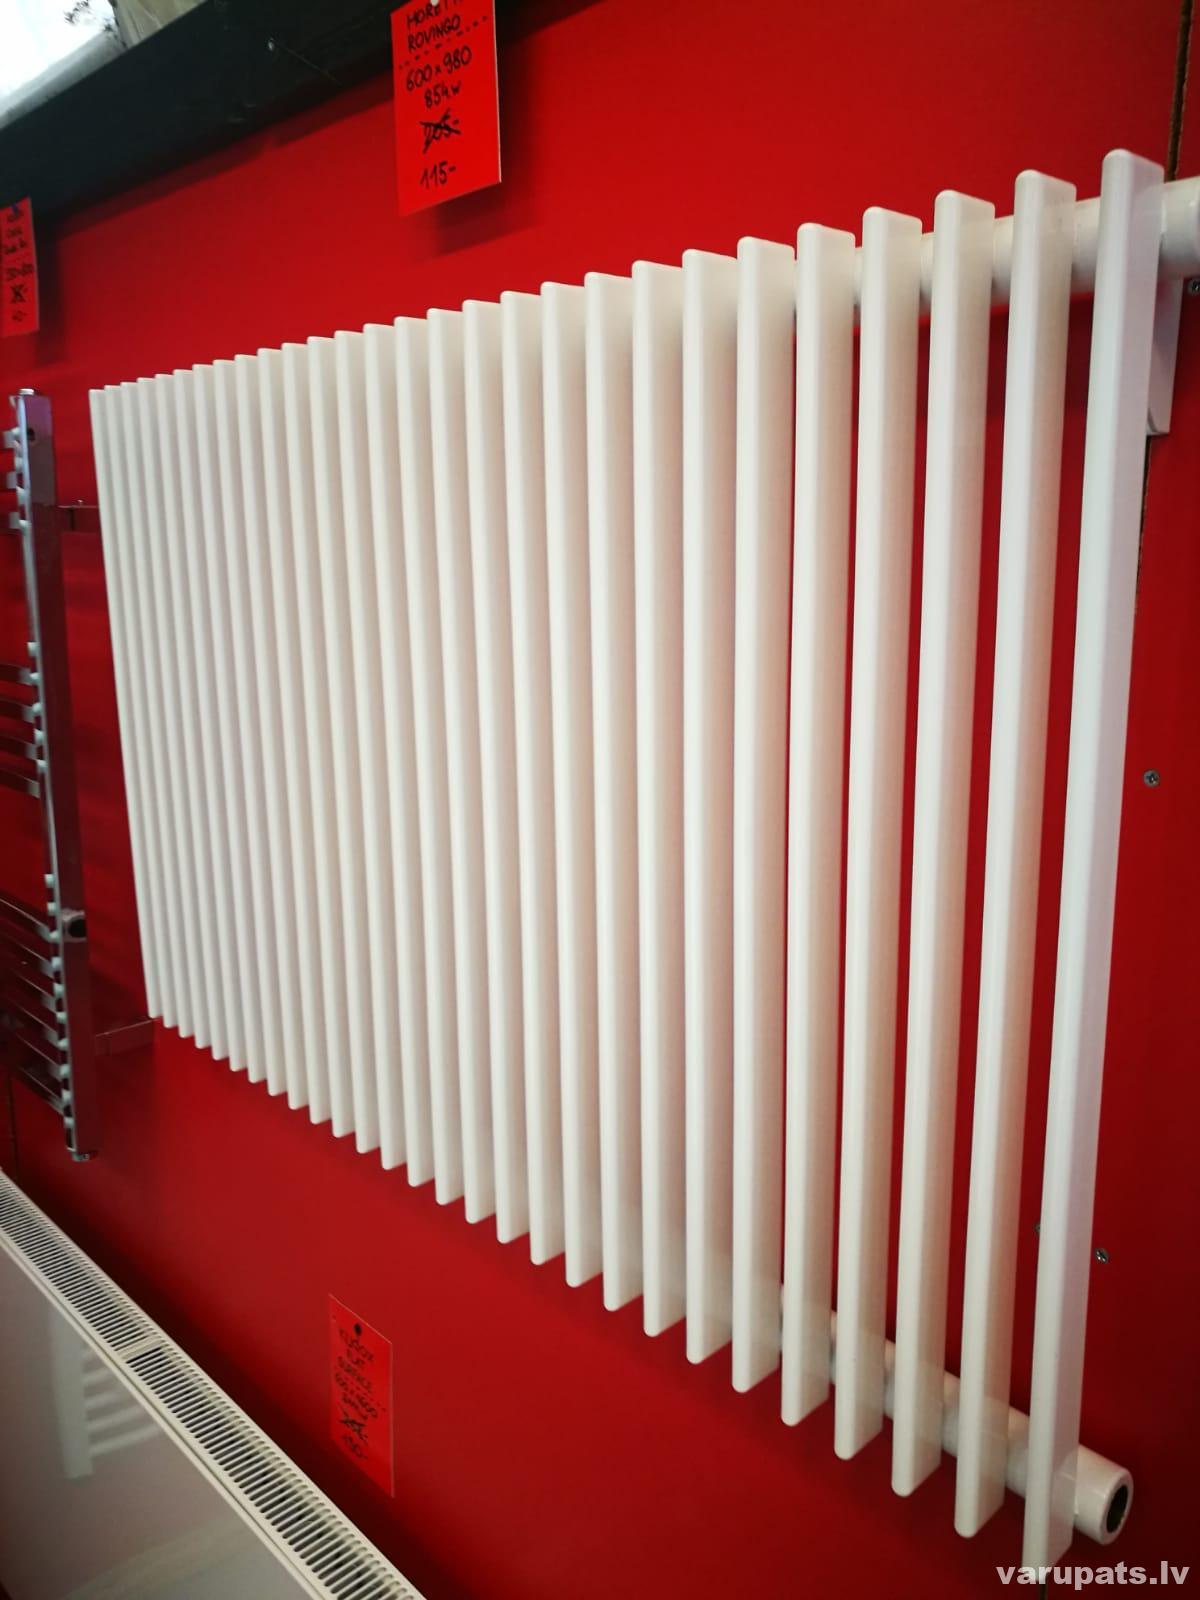 dizaina radiatori, dizaina radiatori kraftlager, radiatori vertikalie, dvielu zavetaji, dizaina radiators, radiators cuguna, radiatros dizaina vertikalais, dizaina radiatori